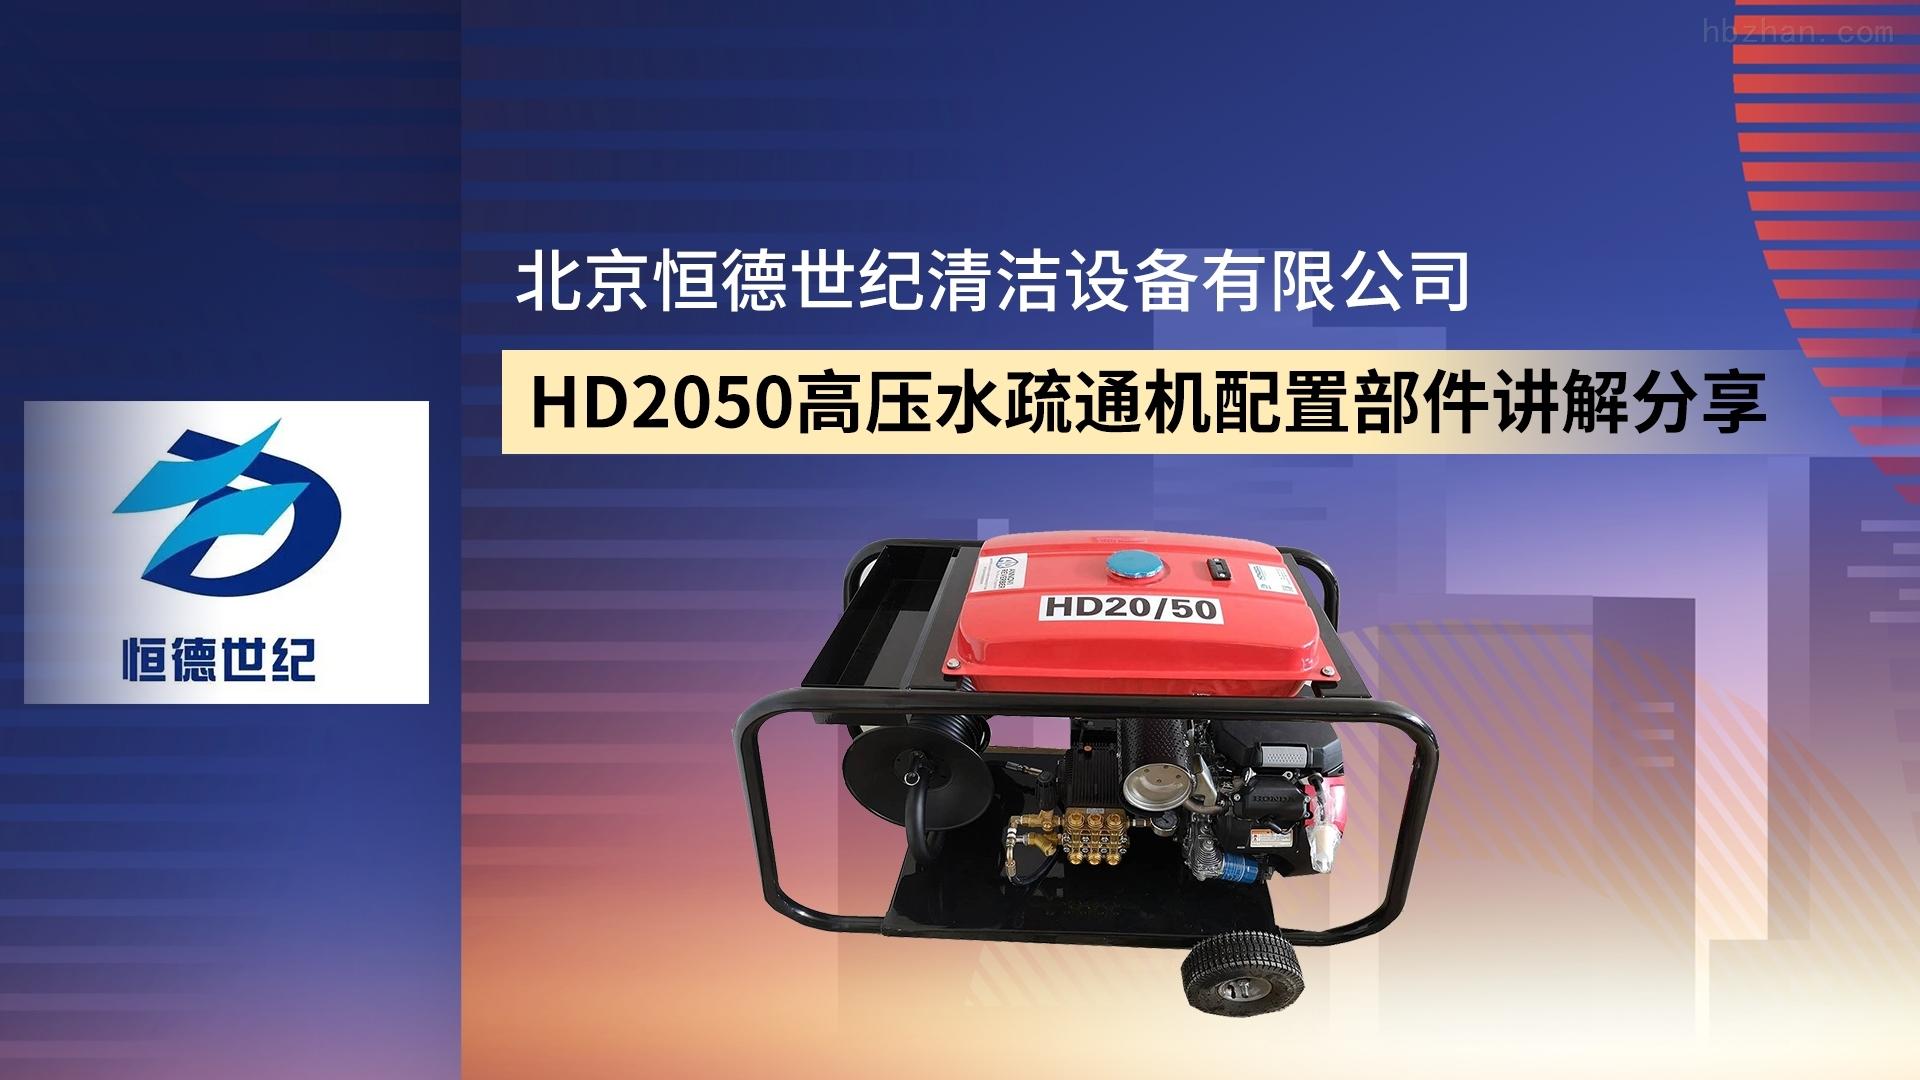 HD2050高压水疏通机配置部件讲解分享